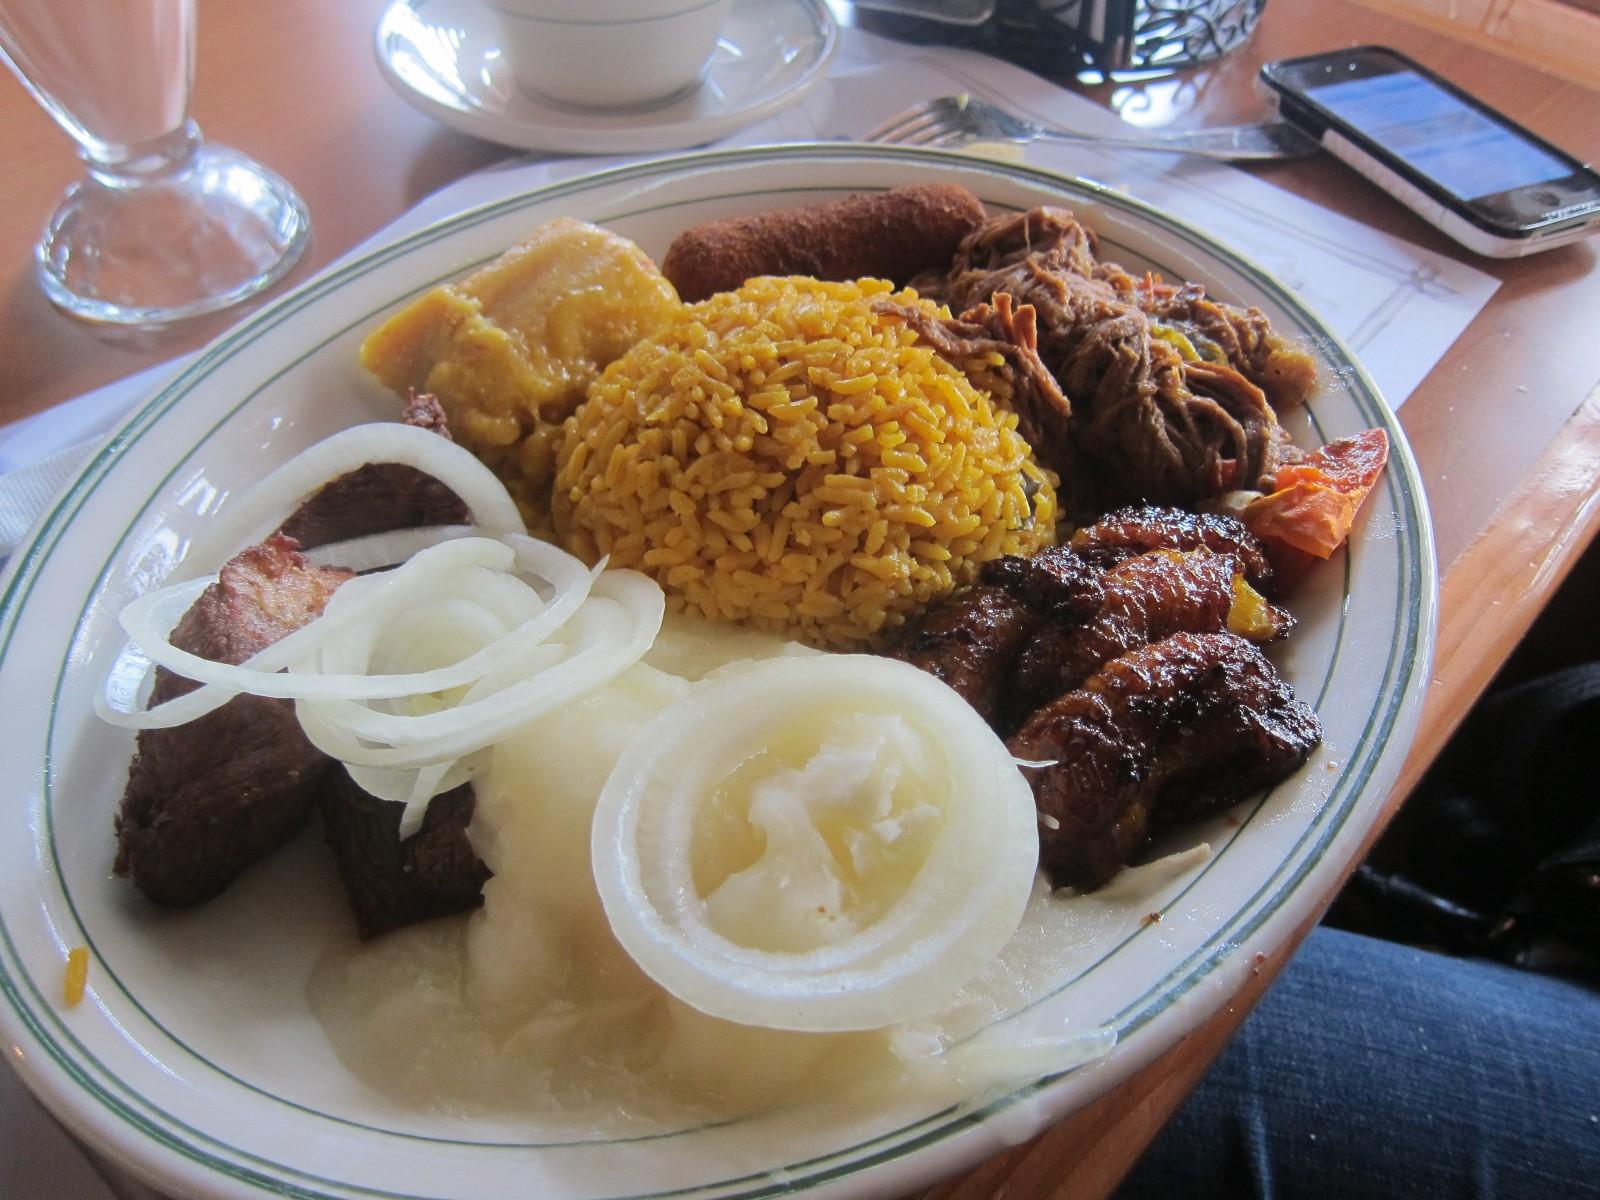 Of la carreta restaurant menu la carreta cuban restaurant for Afghan cuisine sugar land menu